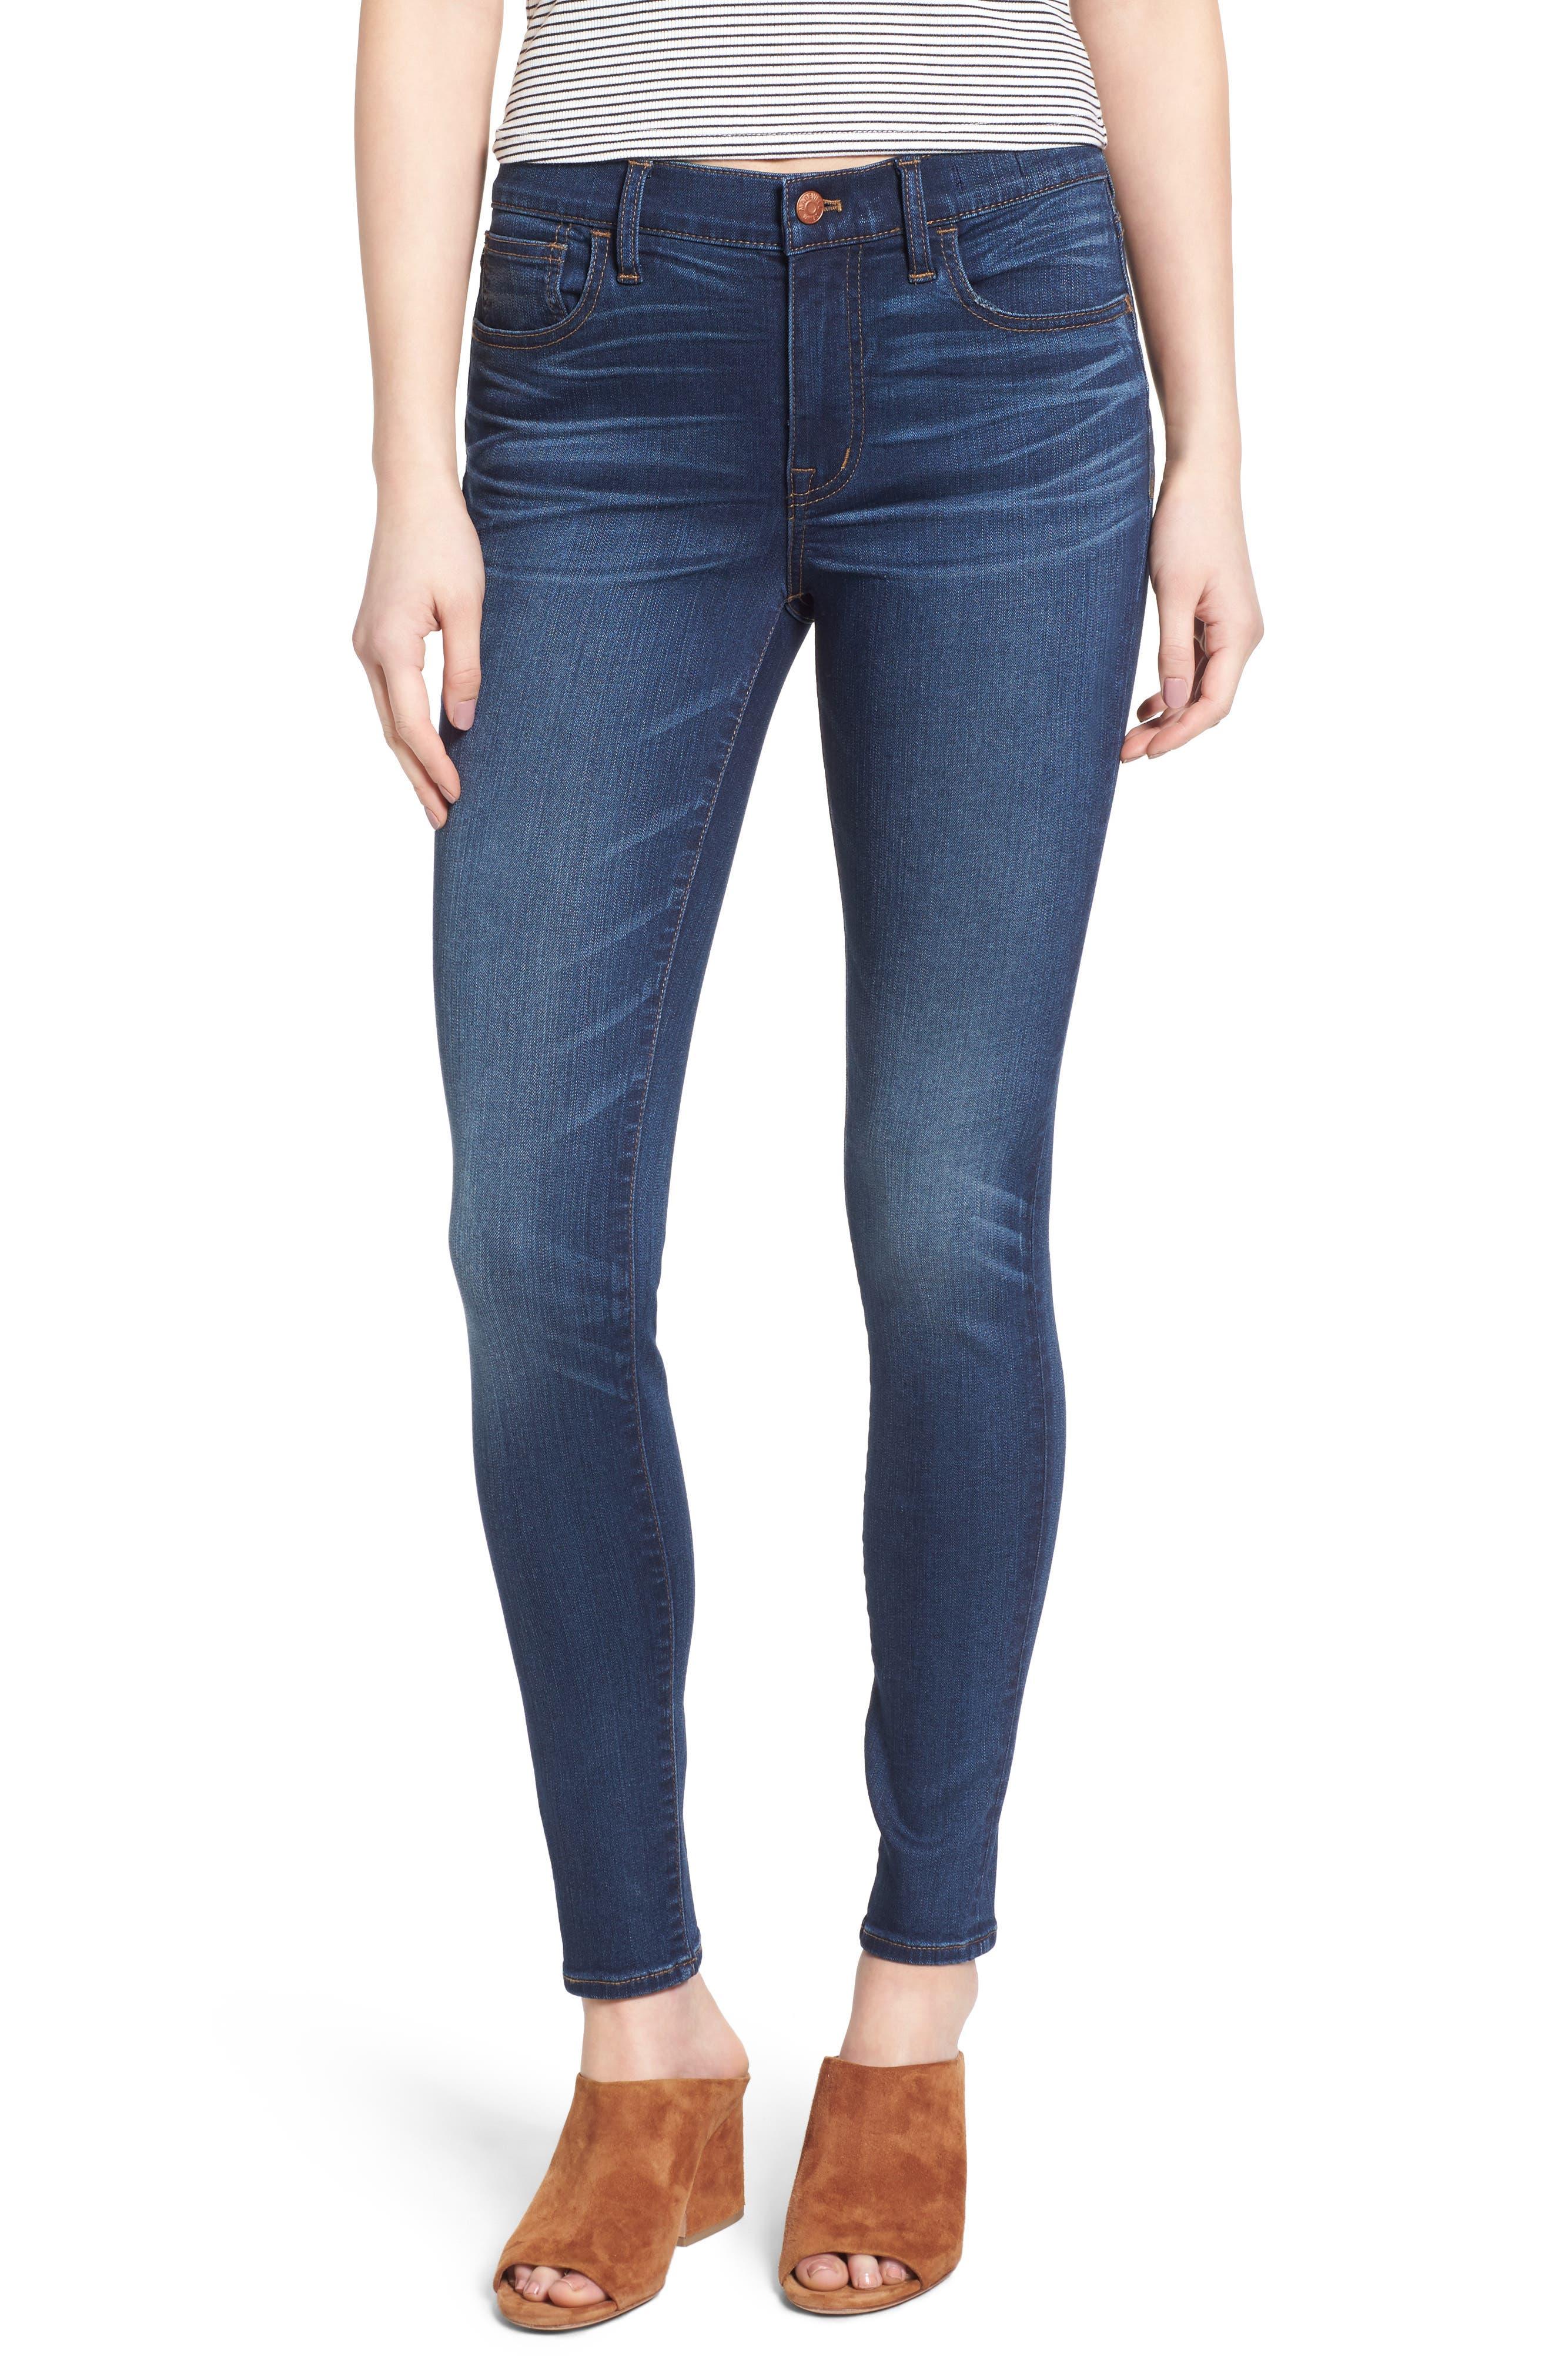 Alternate Image 1 Selected - Madewell Roadtripper Jeans (Darryl Wash)